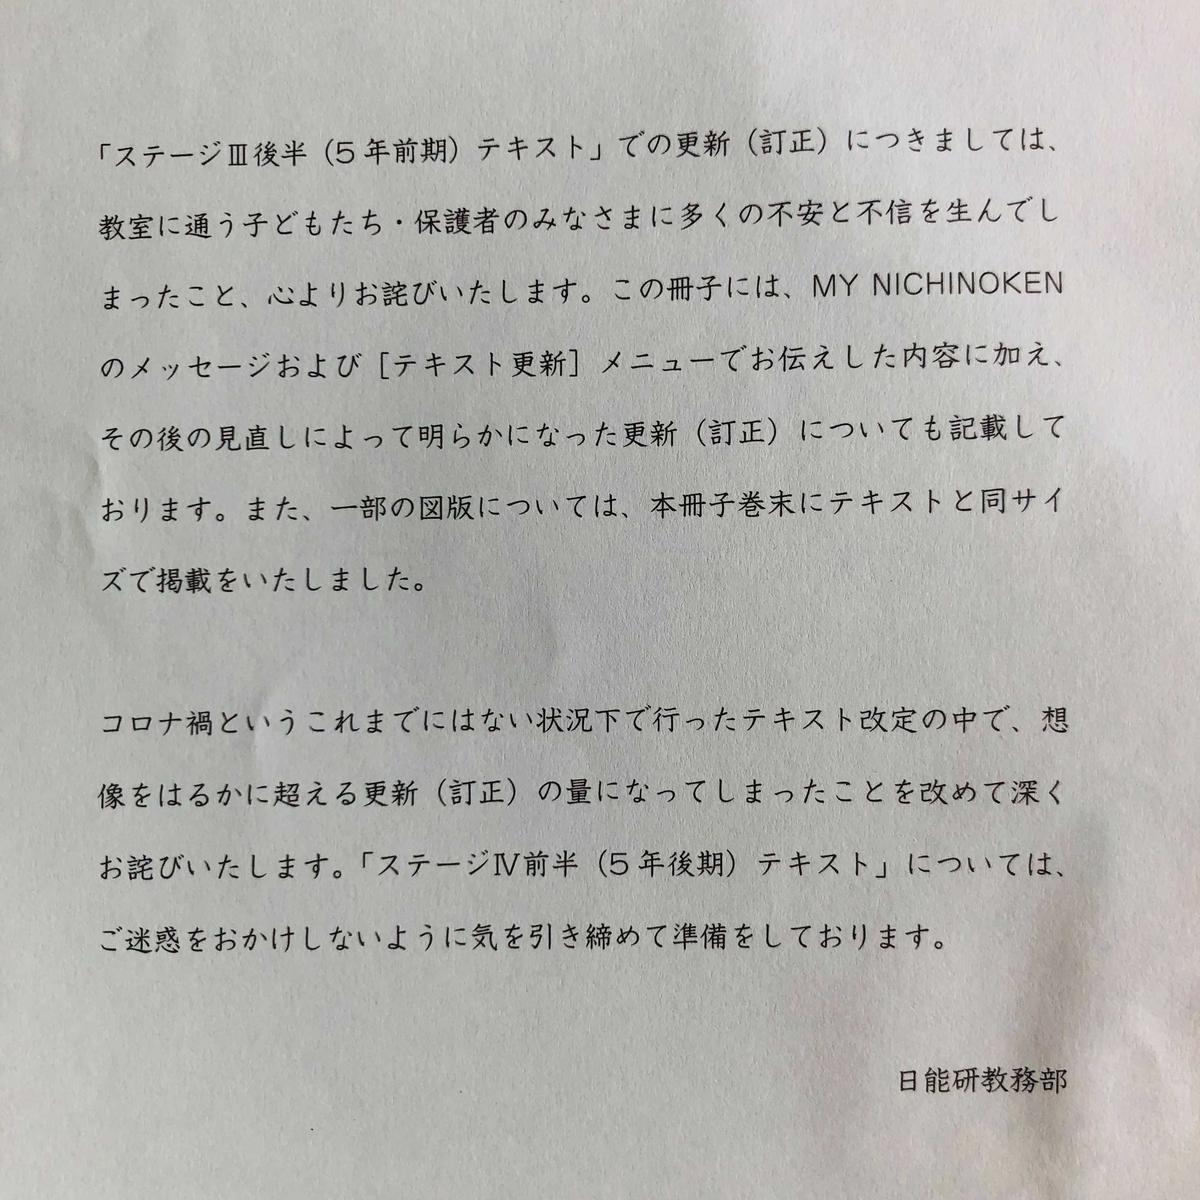 f:id:sakurako-tulipko:20210917094125j:plain